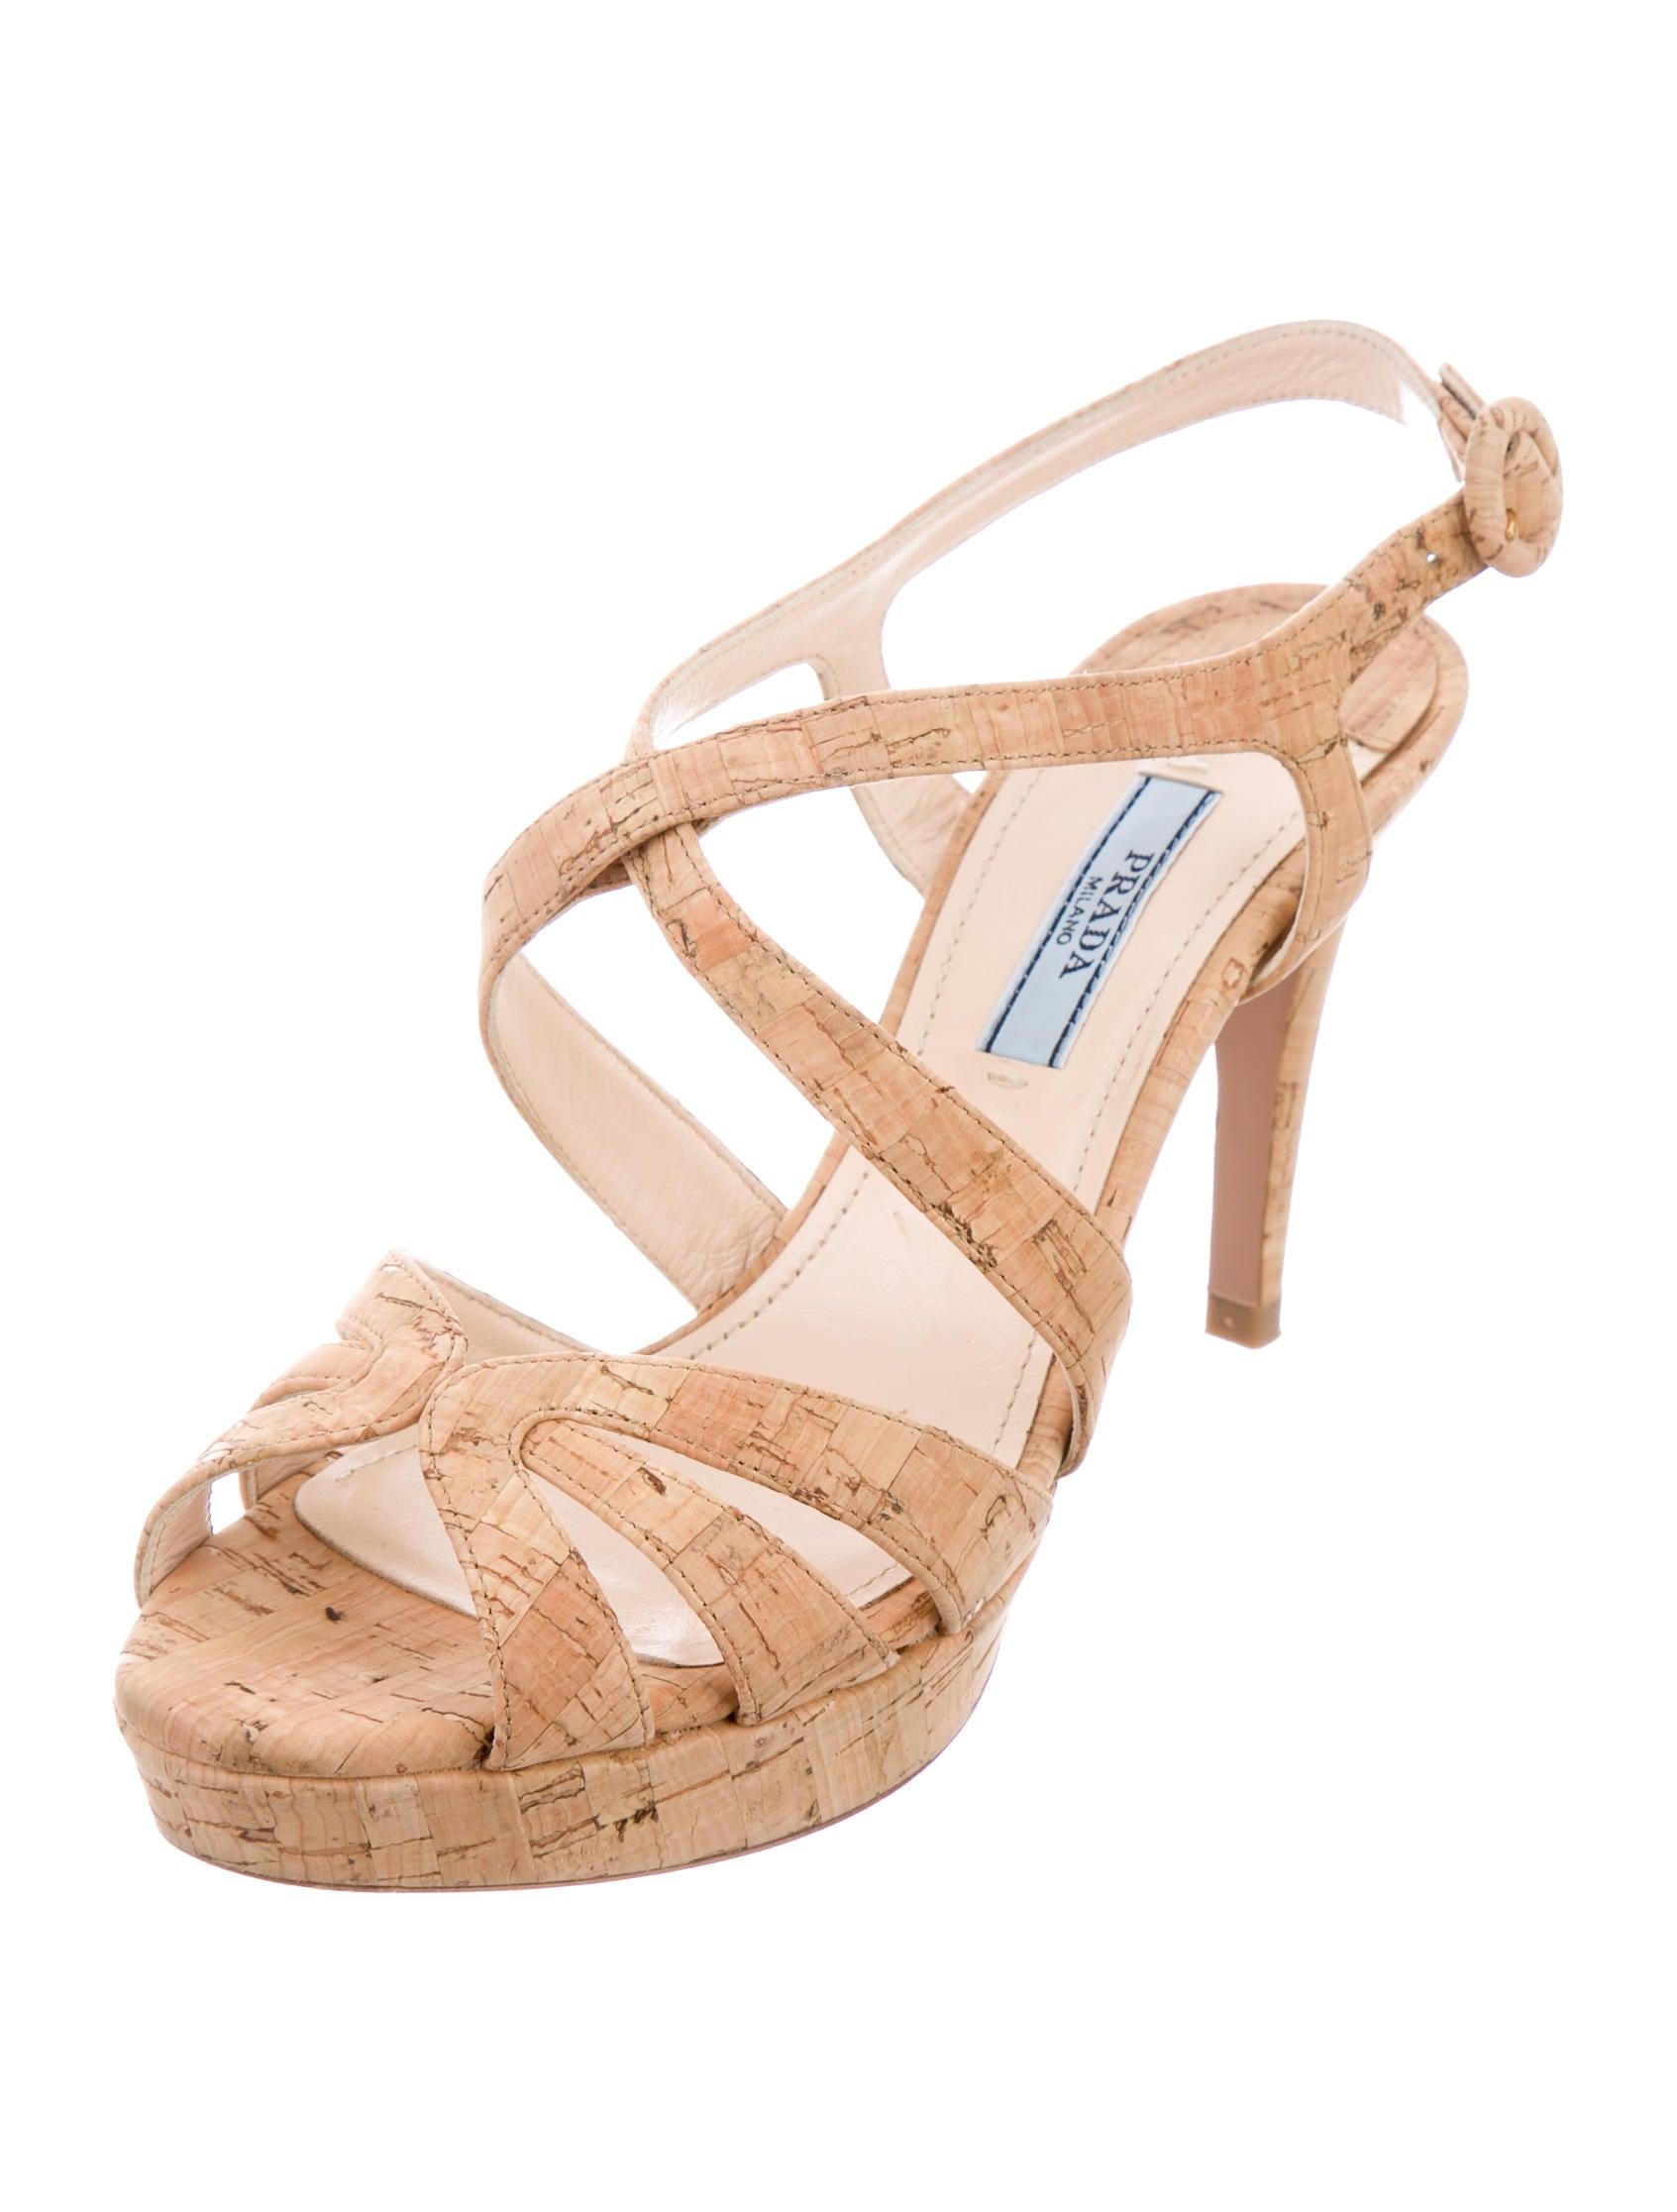 Prada Cork Platform Sandals Shoes Pra139344 The Realreal